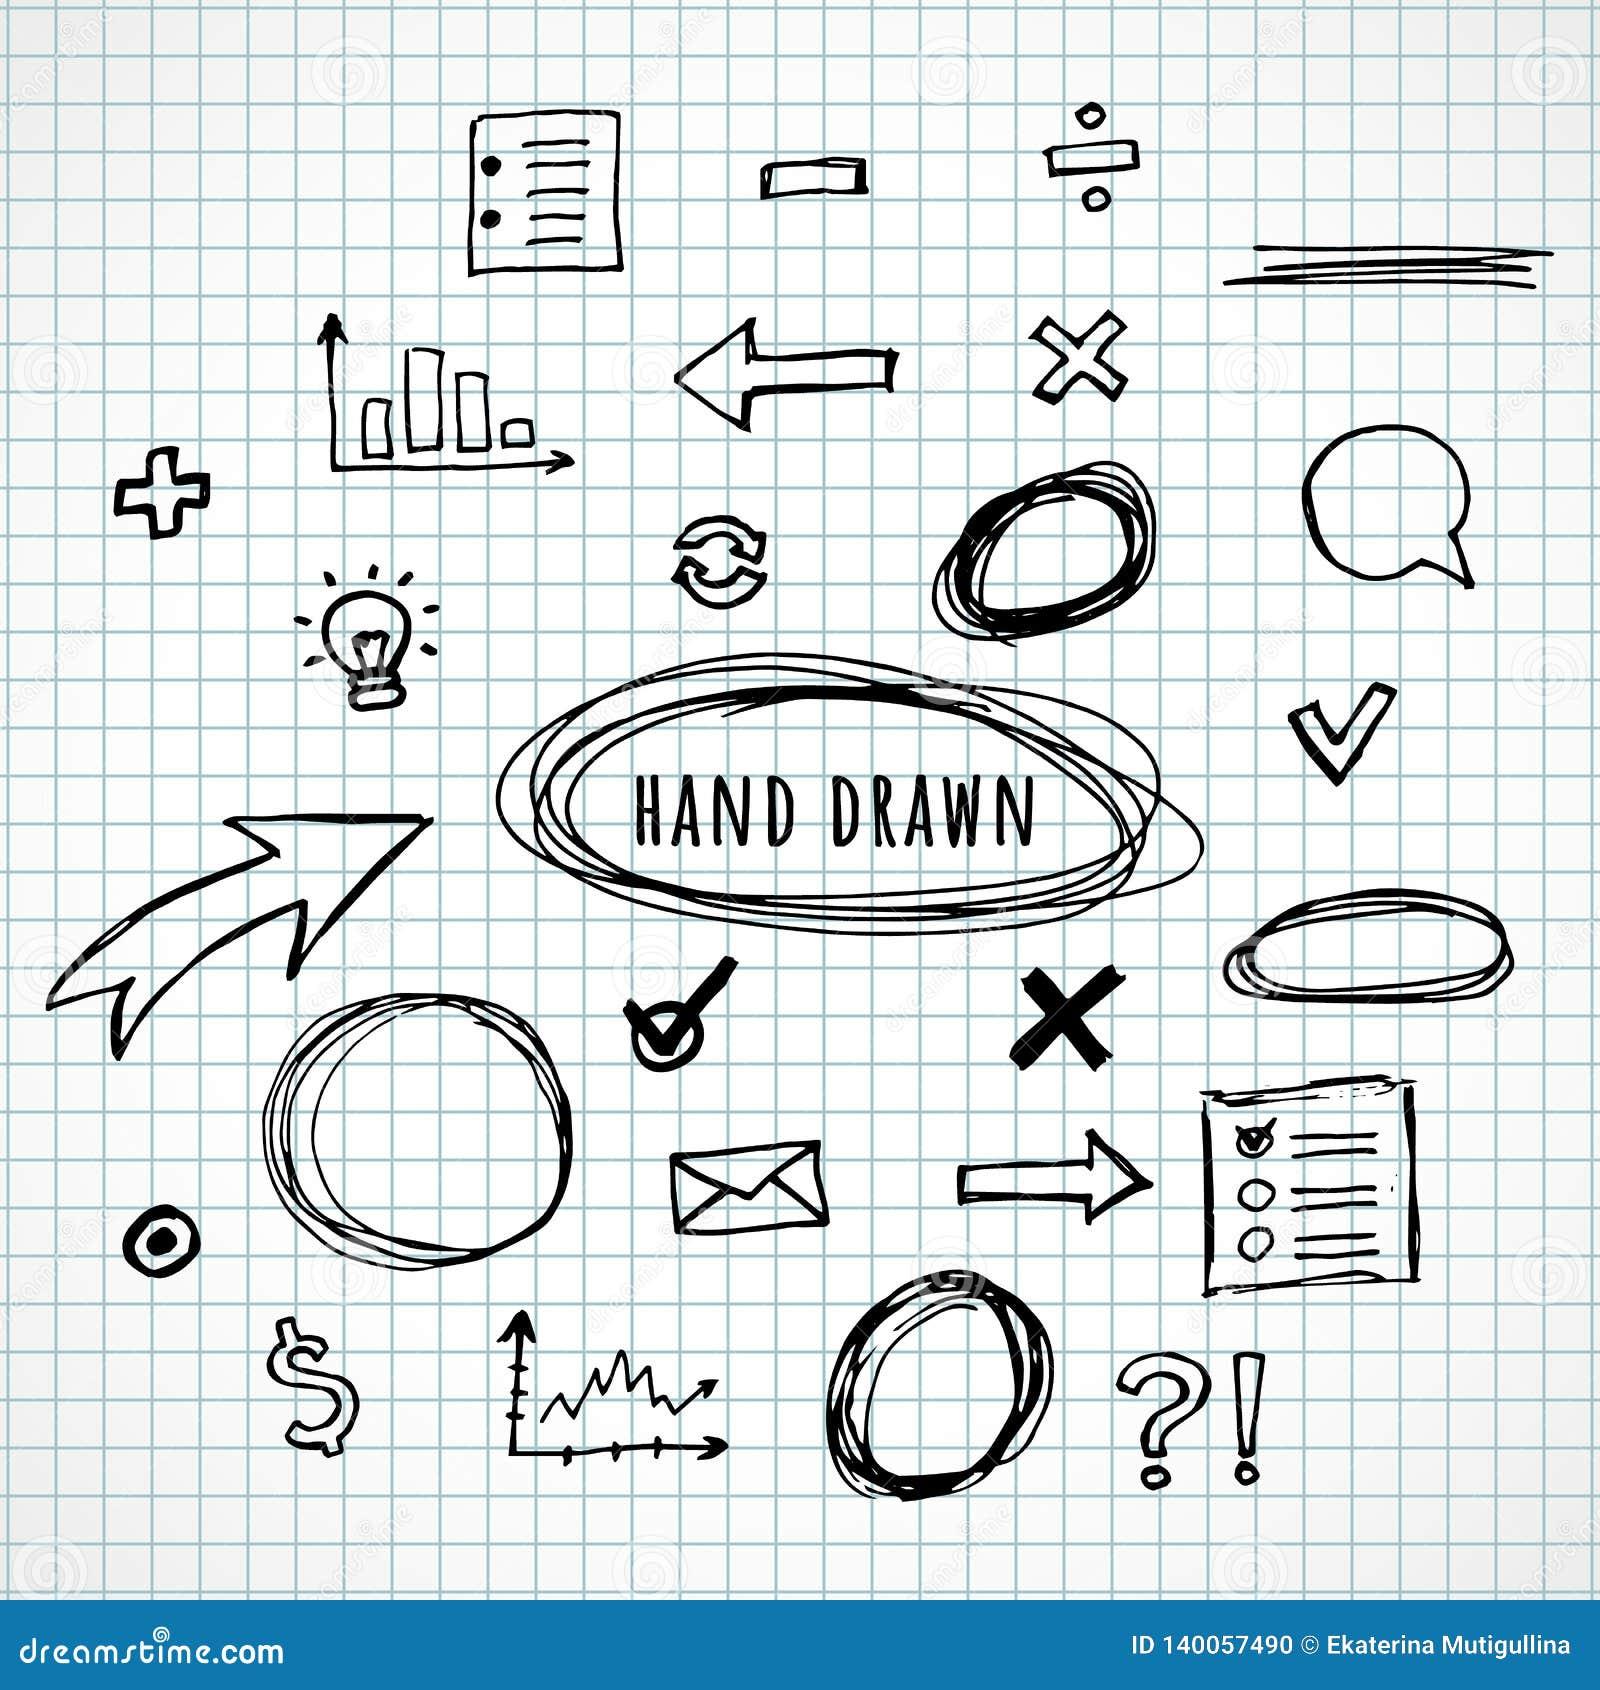 Hand drawn elements sketch